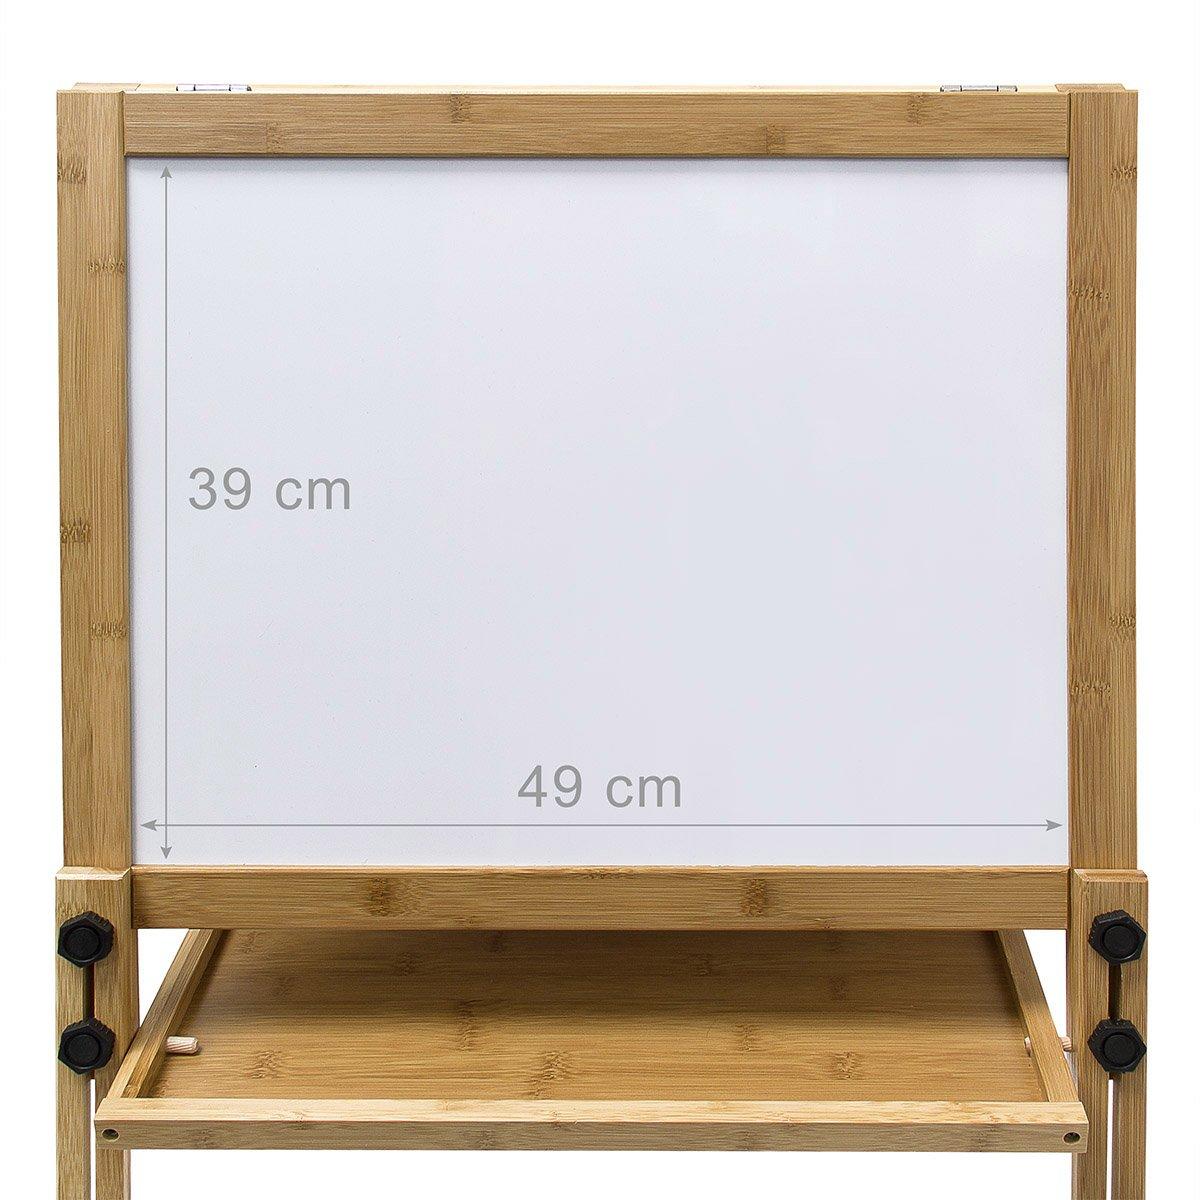 Relaxdays - Pizarra infantil + caballete, magnetizada, 93 x 56.5 x 56.5 cm, Altura ajustable, color blanco